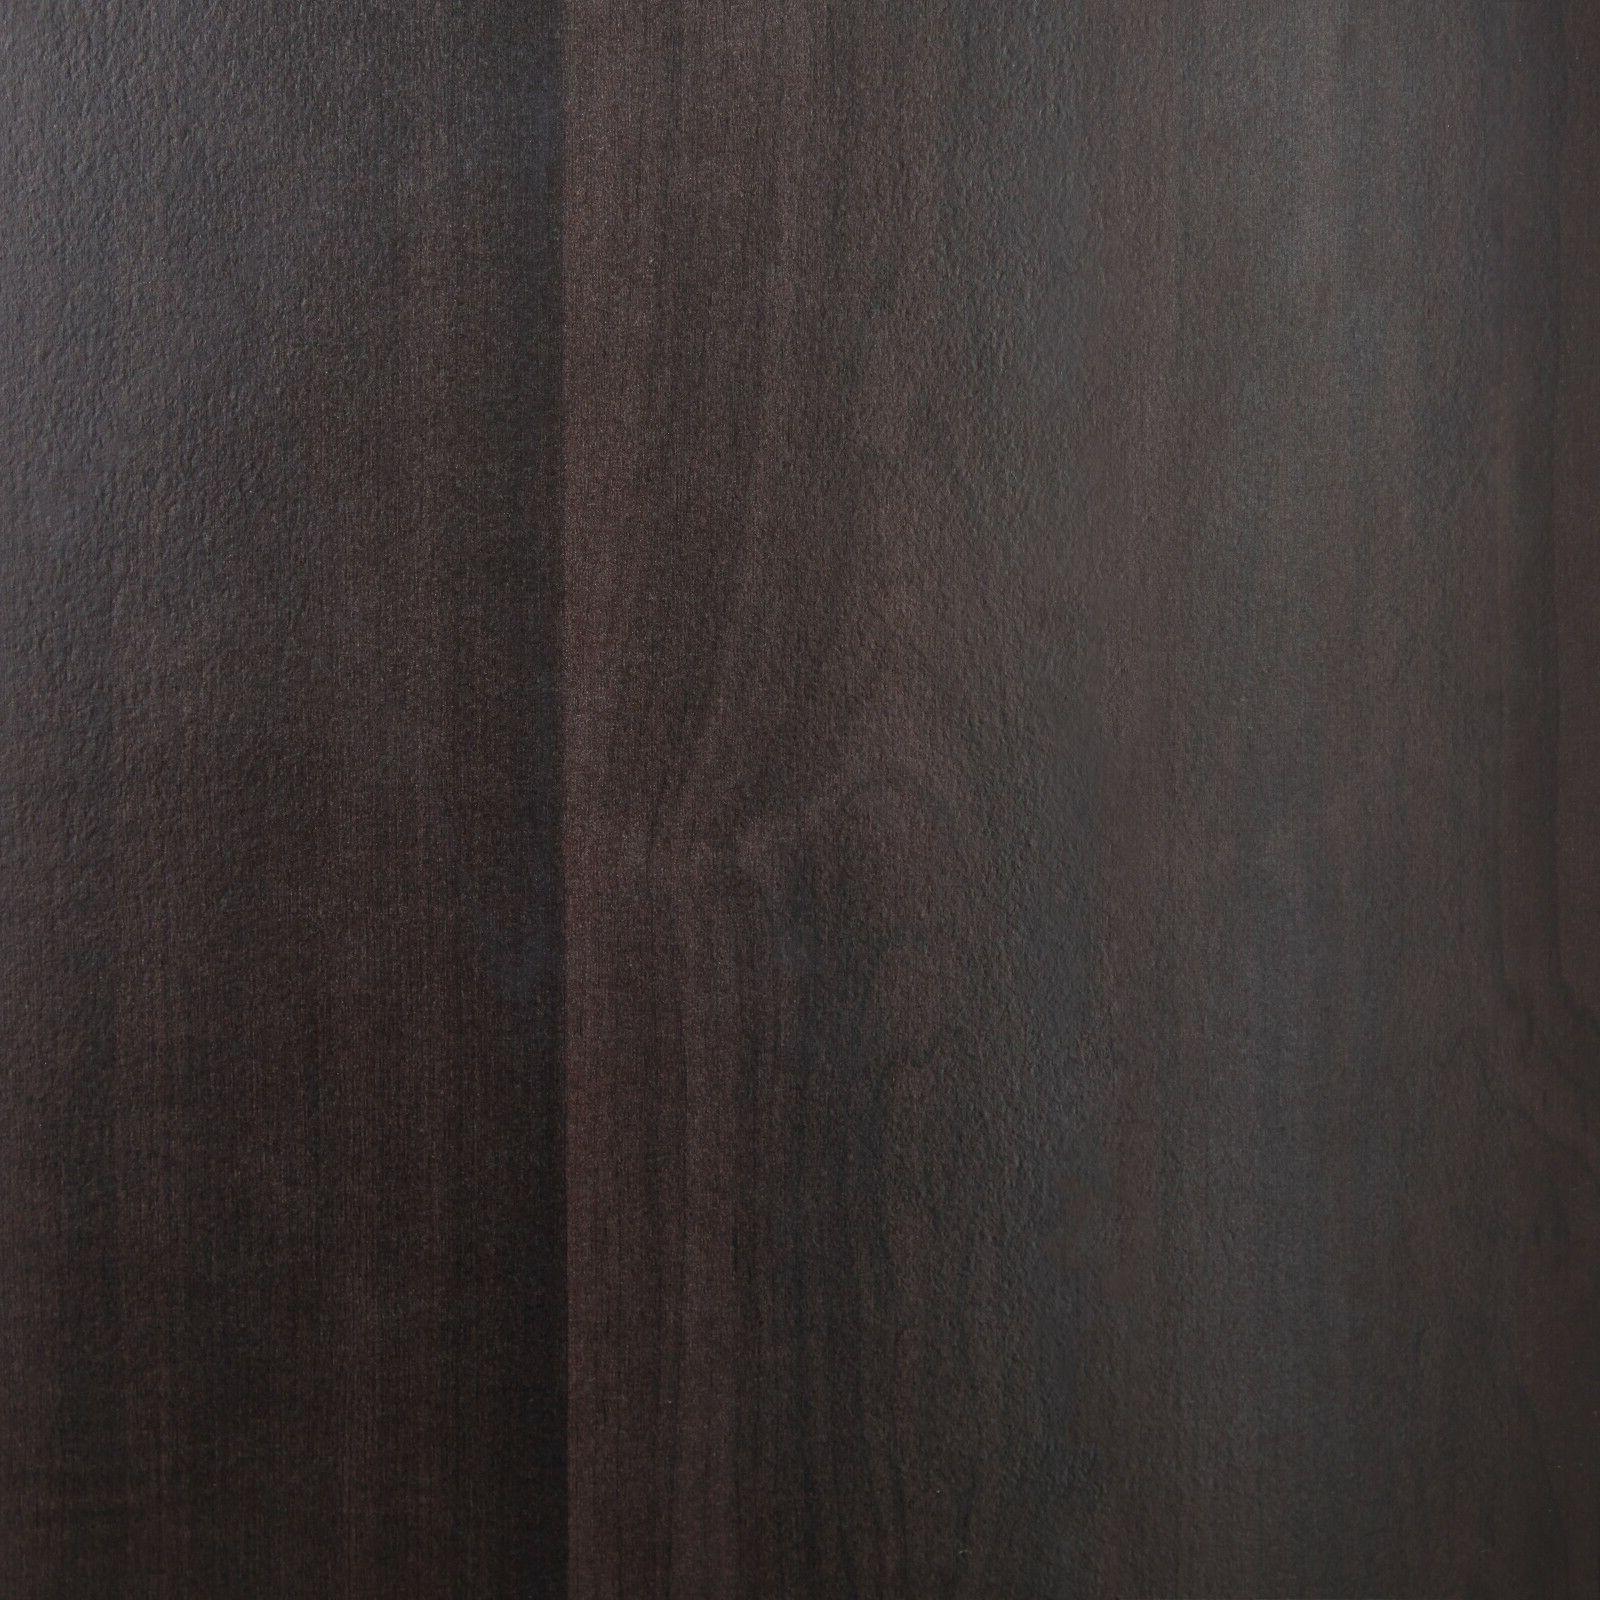 Adjustable 5-Shelf Bookcase Wood Book Shelving Storage Wide